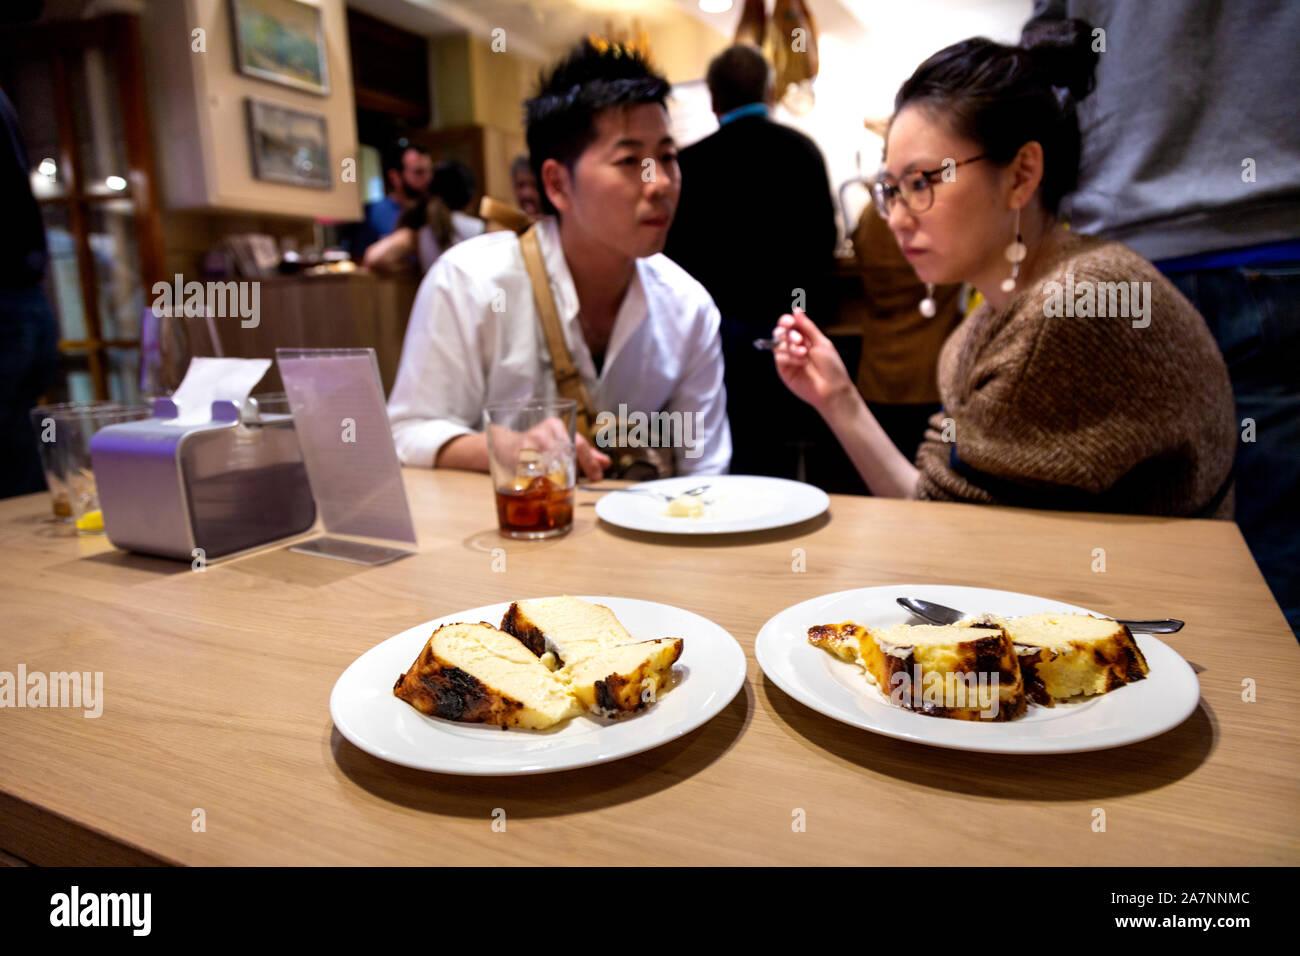 Famous Burnt Basque Cheesecake At La Vina San Sebastian Spain Stock Photo Alamy